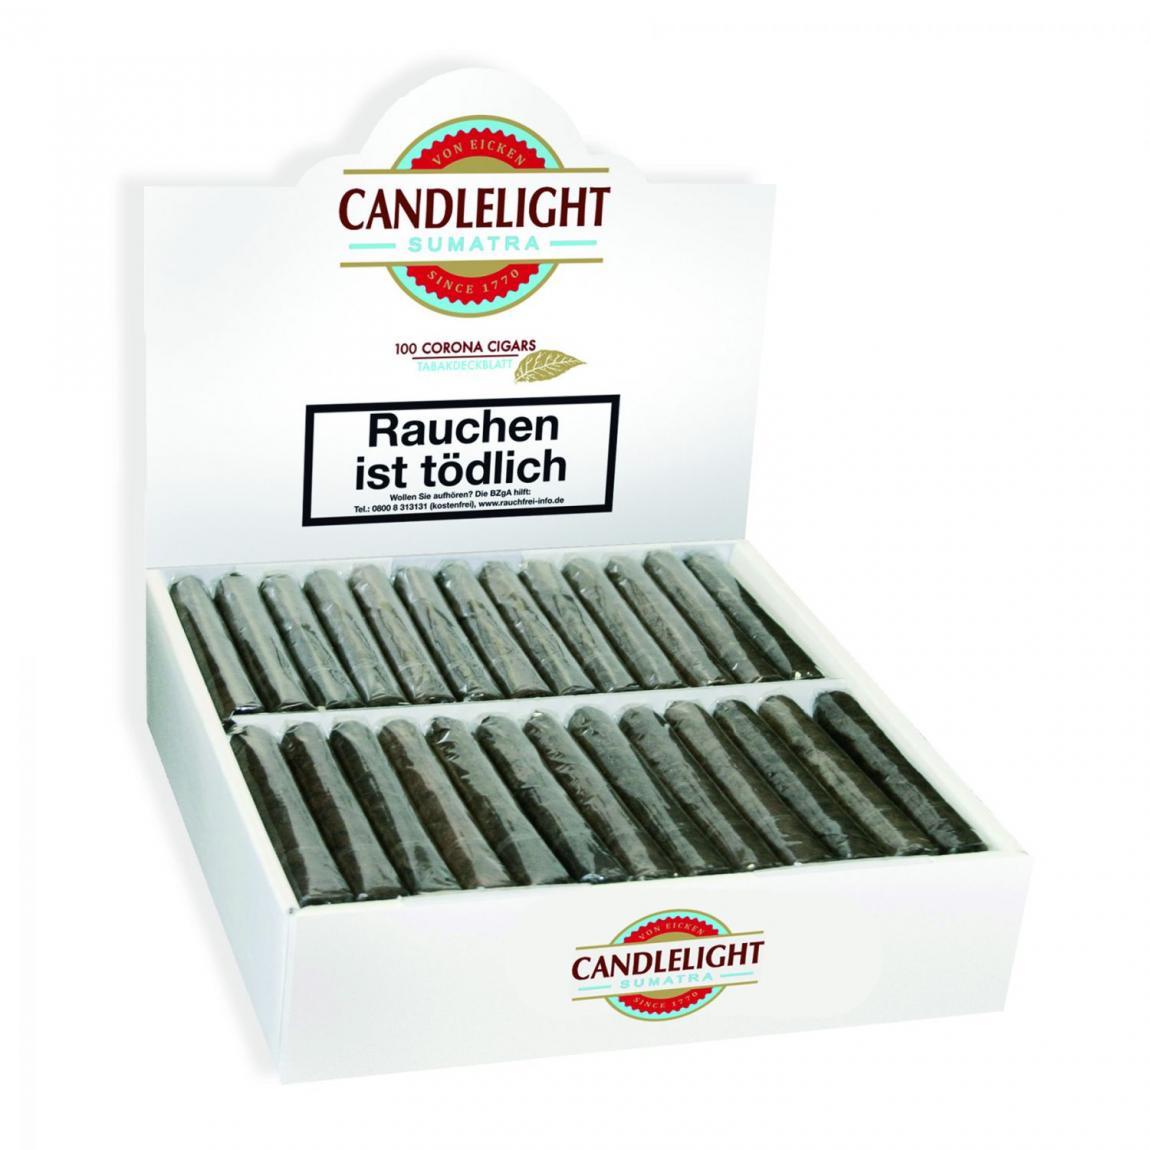 Candlelight Coronas 100 Sumatra 100er Karton